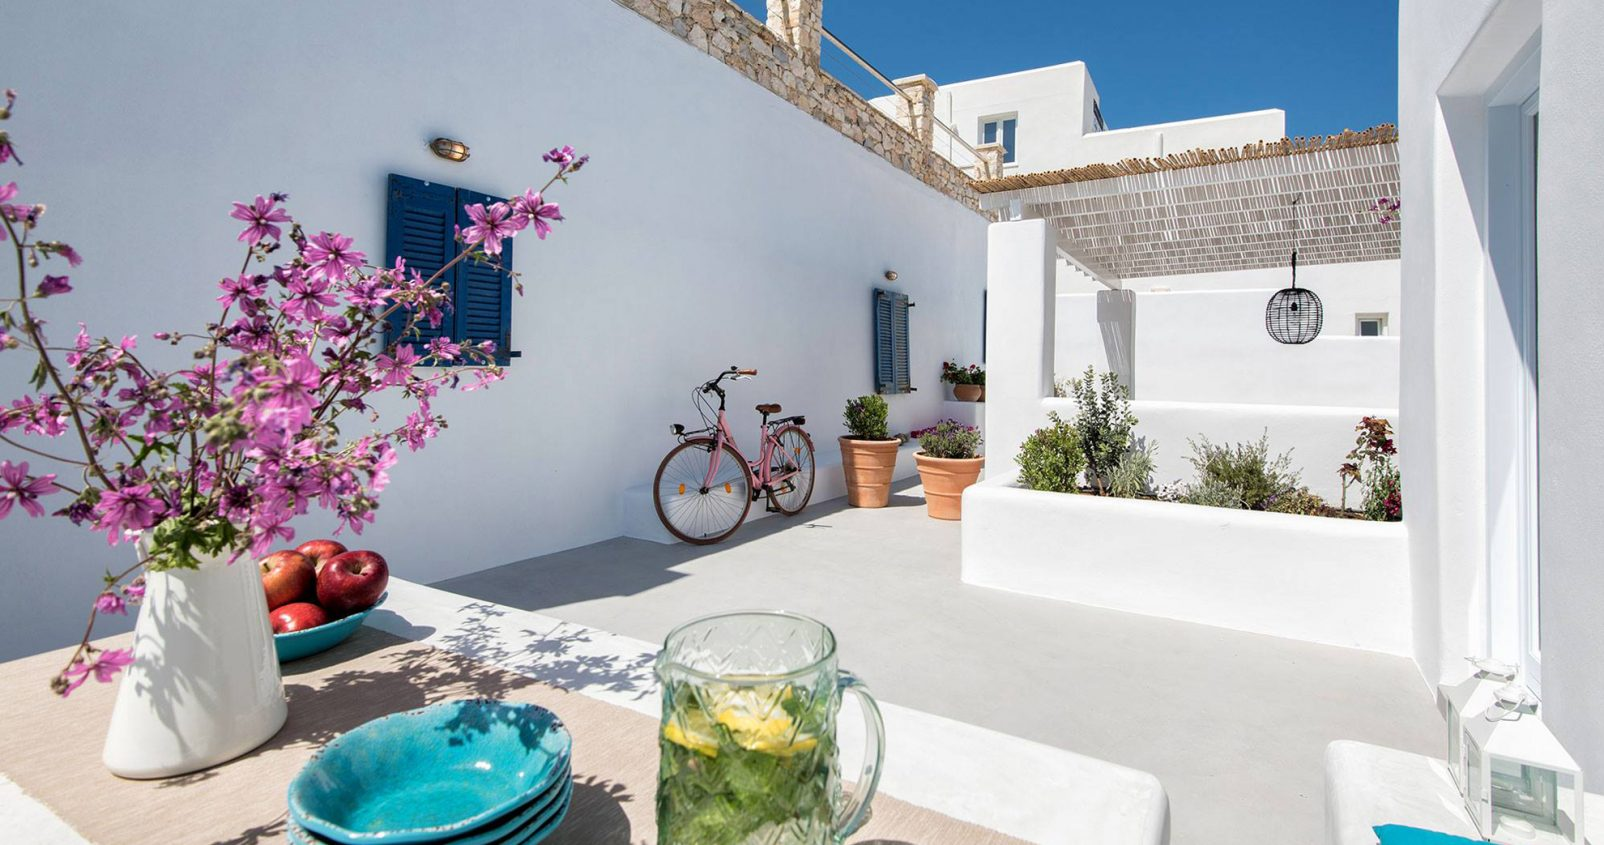 בית ביוון, עיצוב ישראלי